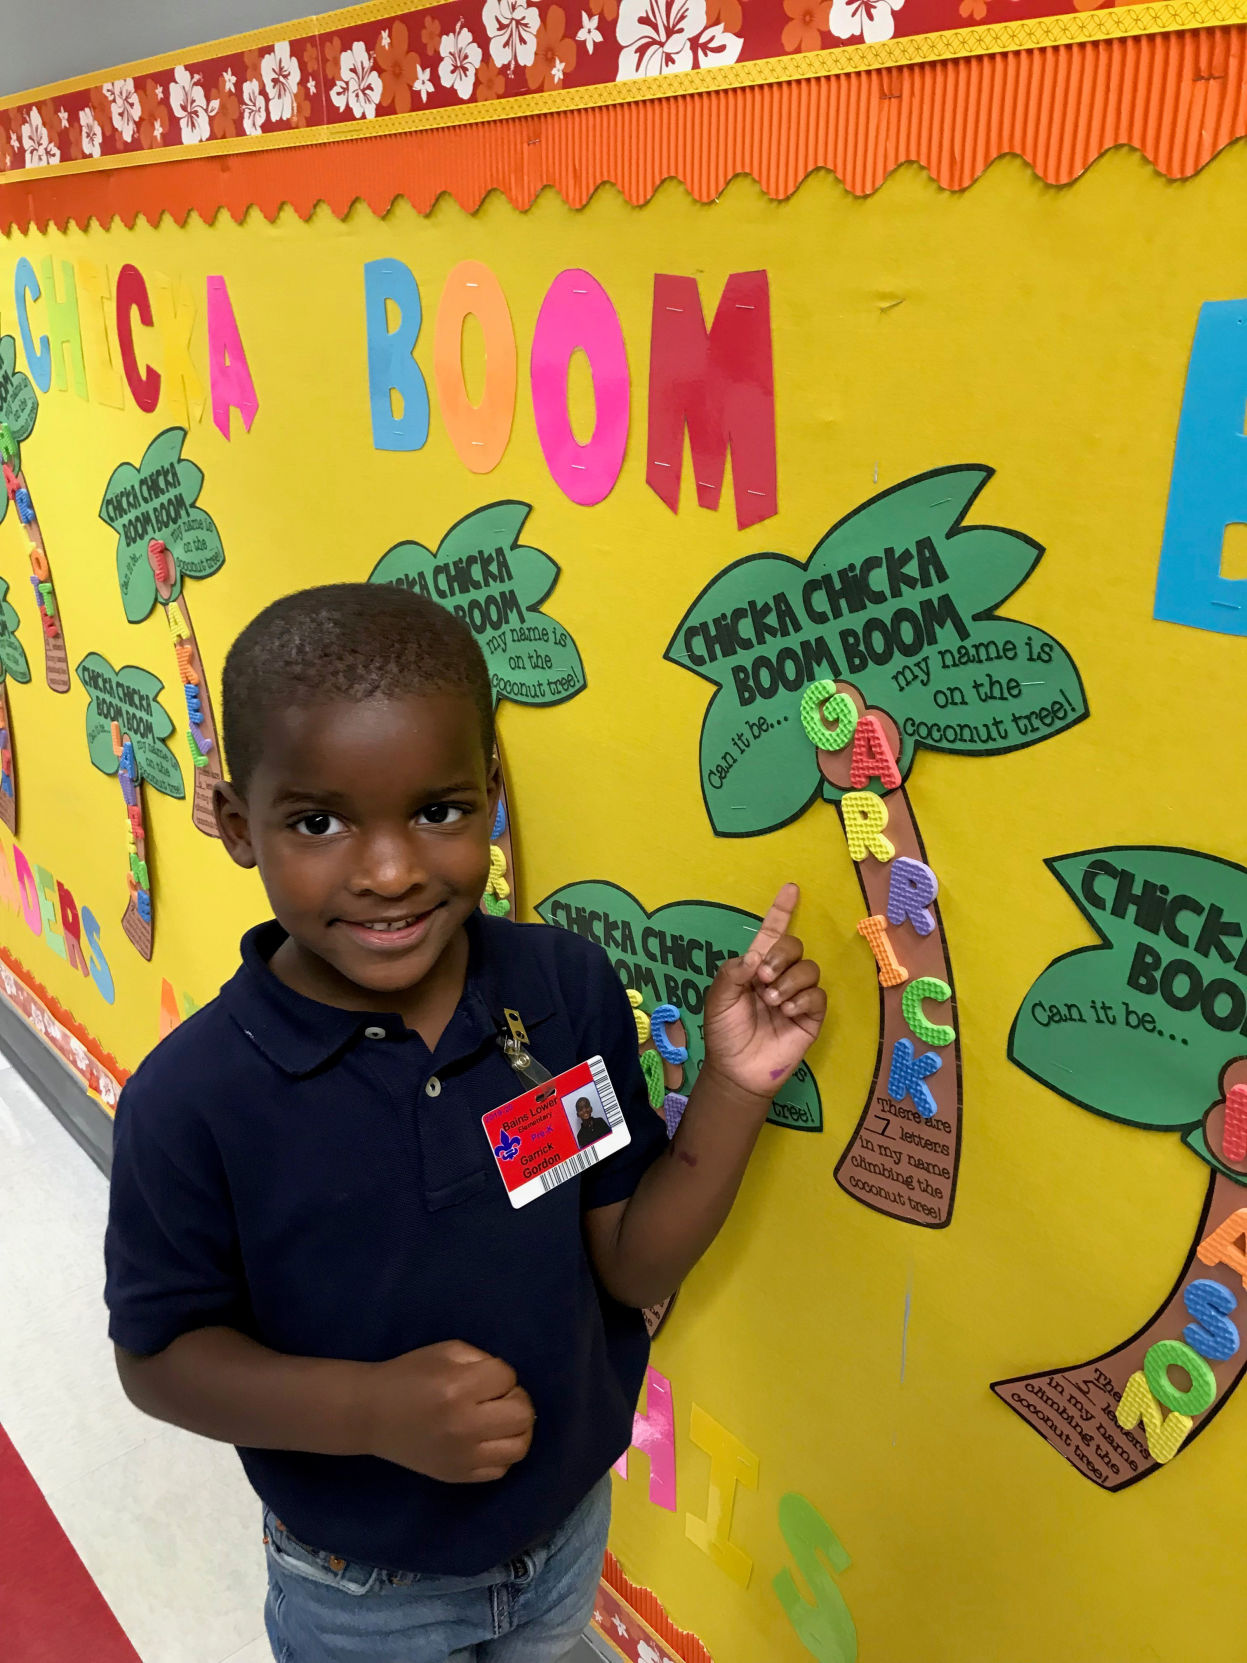 Bains Lower Elementary School displays student's art work on bulletin board